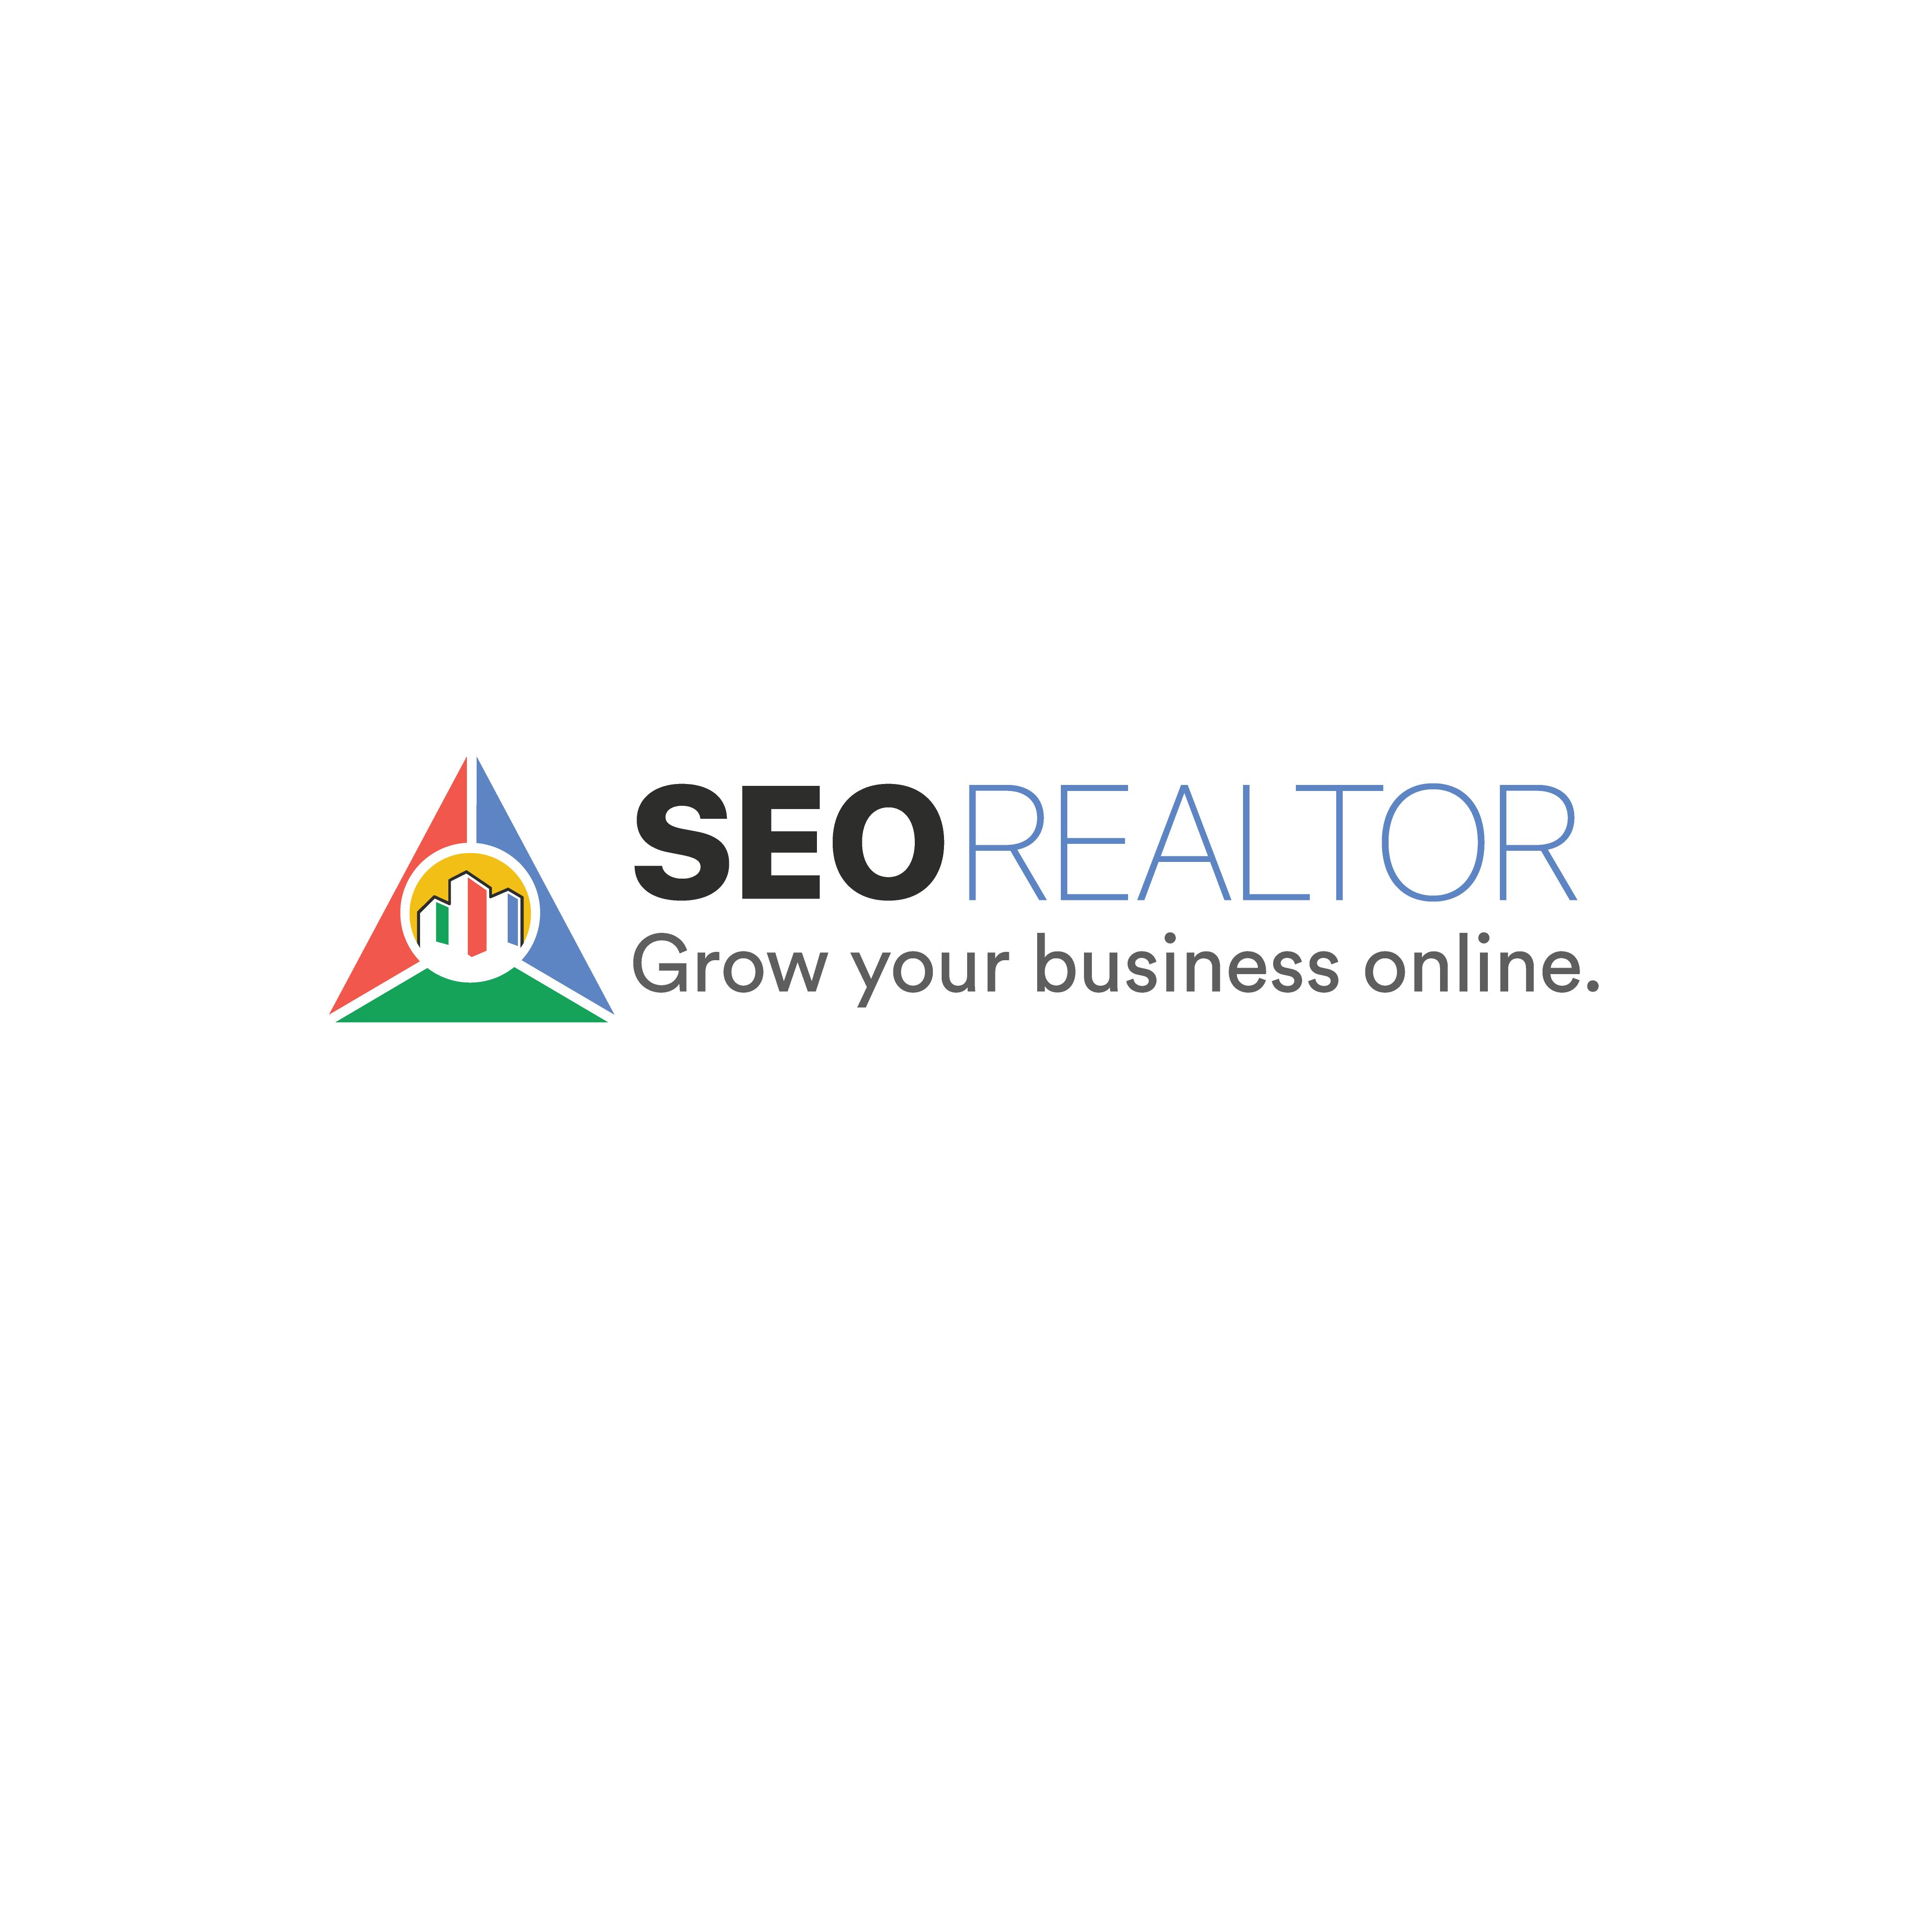 SEO Realtor Hub